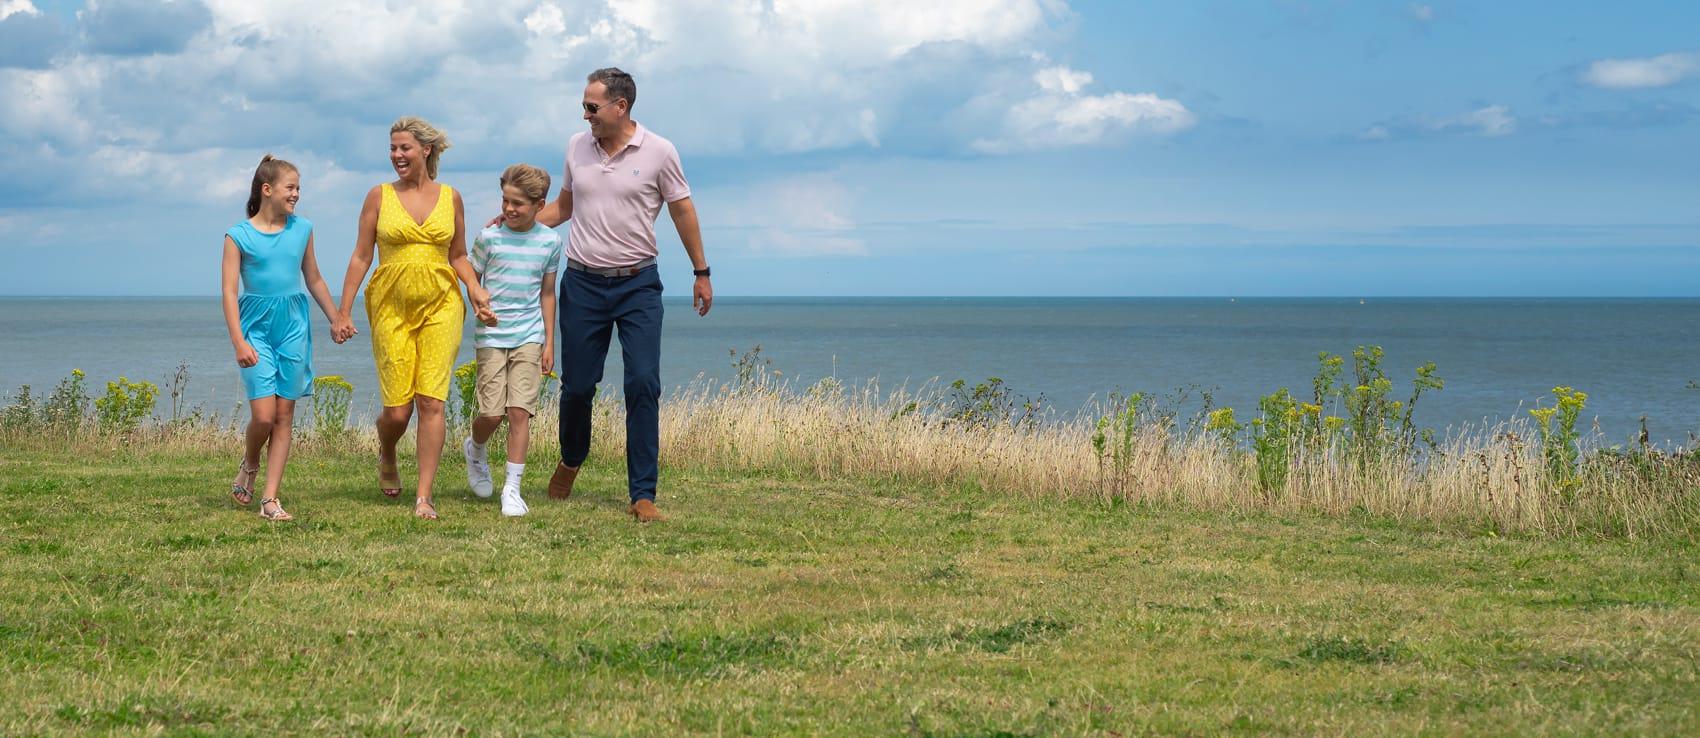 Family walking by the coast